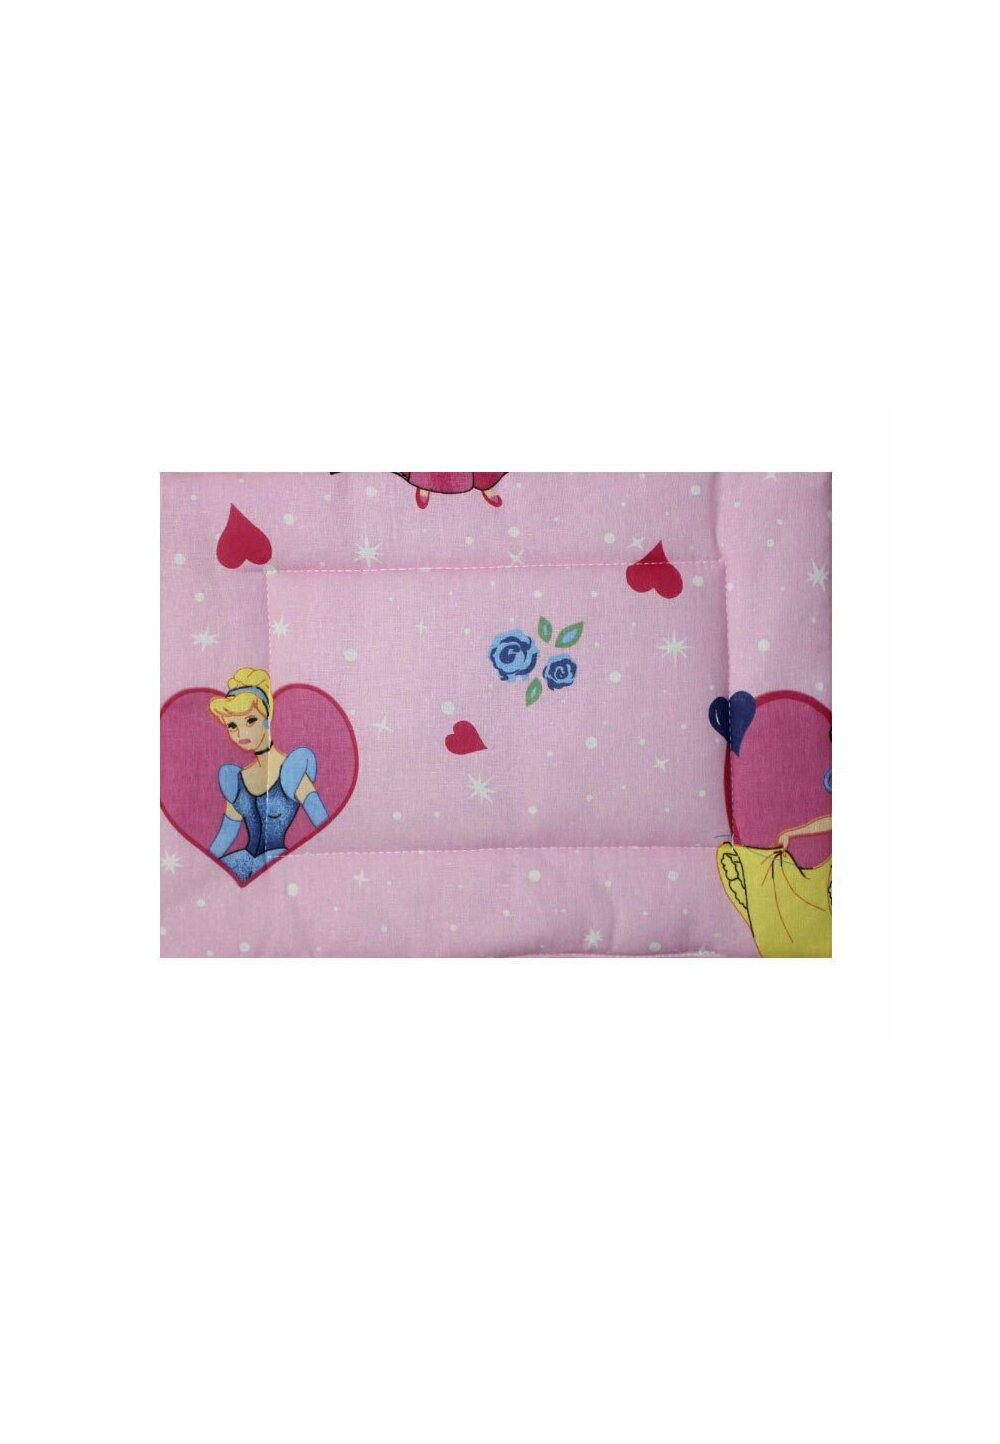 Perna slim, printese, roz, 37x28cm imagine